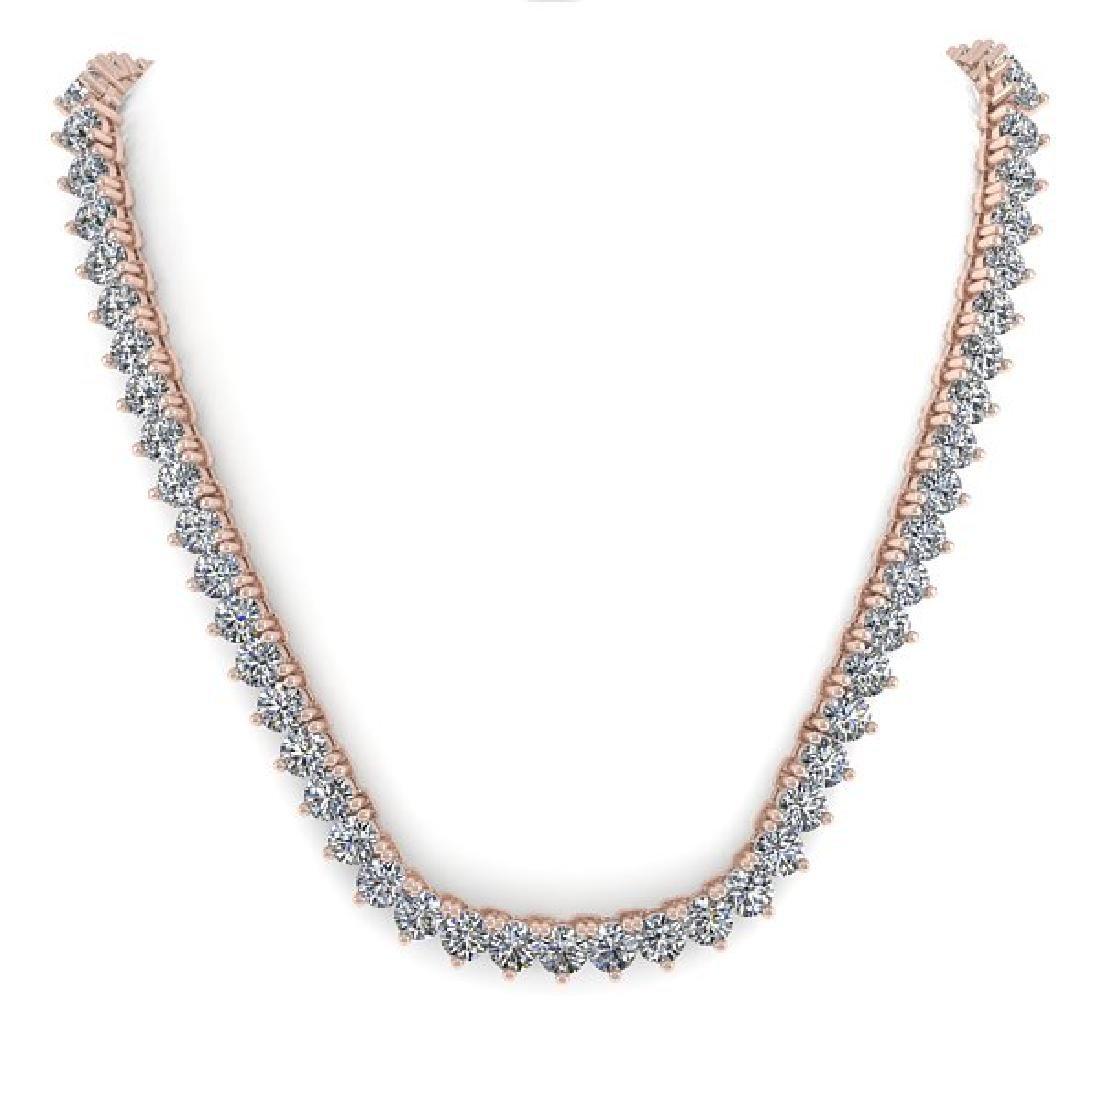 10 CTW Solitaire VS/SI Diamond Necklace 14K Rose Gold - 3